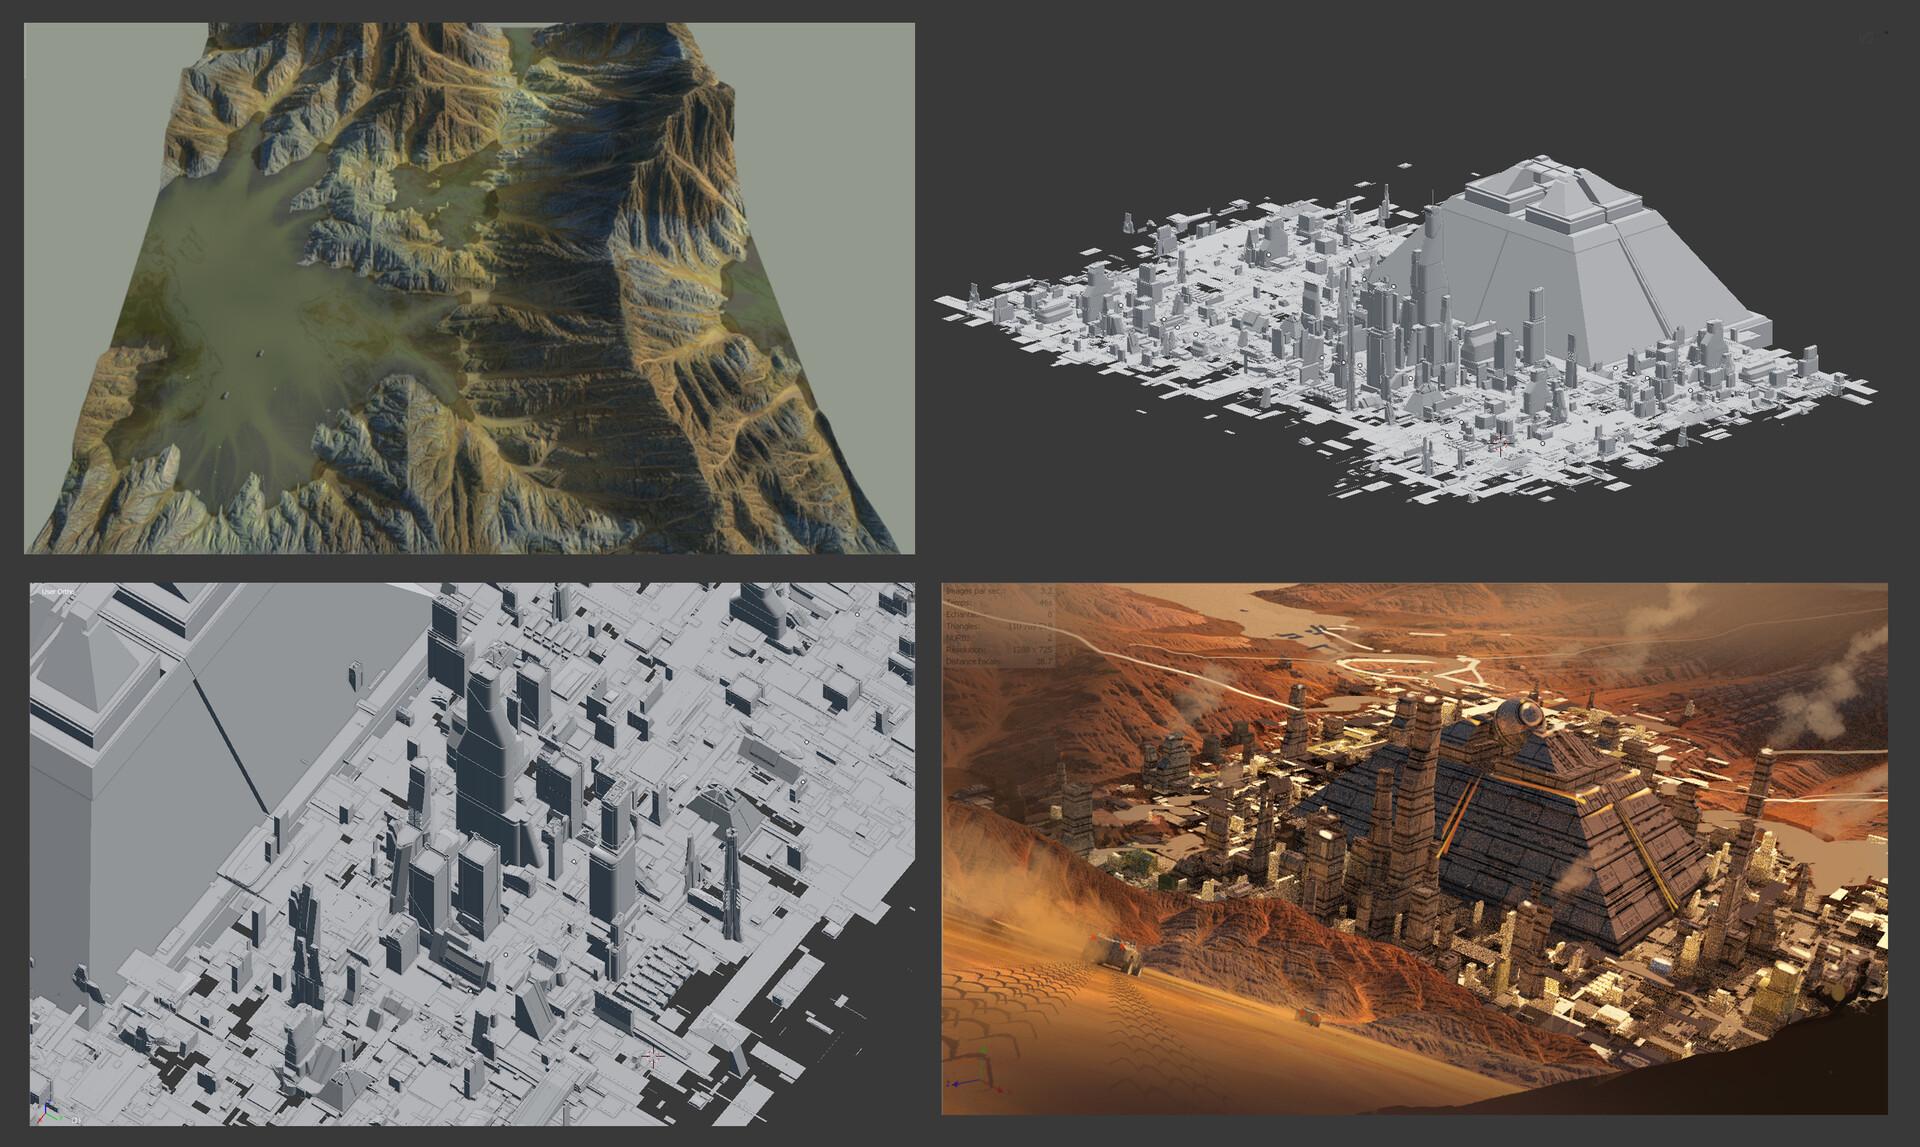 3D assets & Thumbnail I did the 3D elements by following Jama Jurabaev's Blender Tutorials.